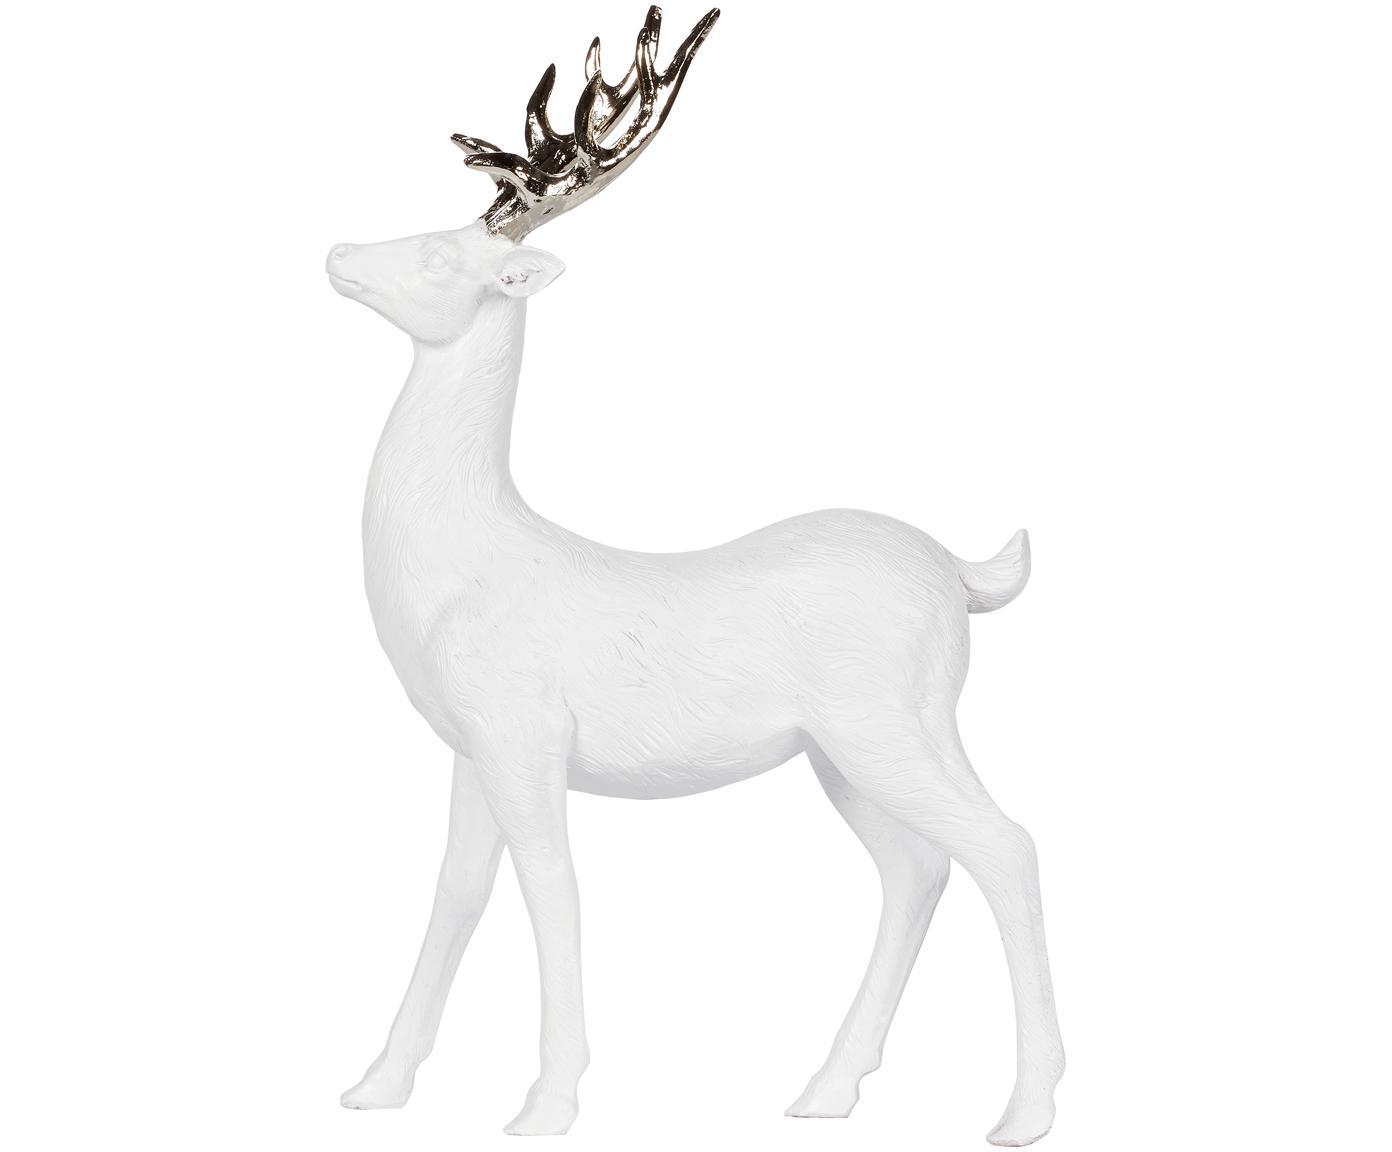 Deko-Objekt Serafina Deer, Polyresin, Weiß, Goldfarben, 24 x 36 cm